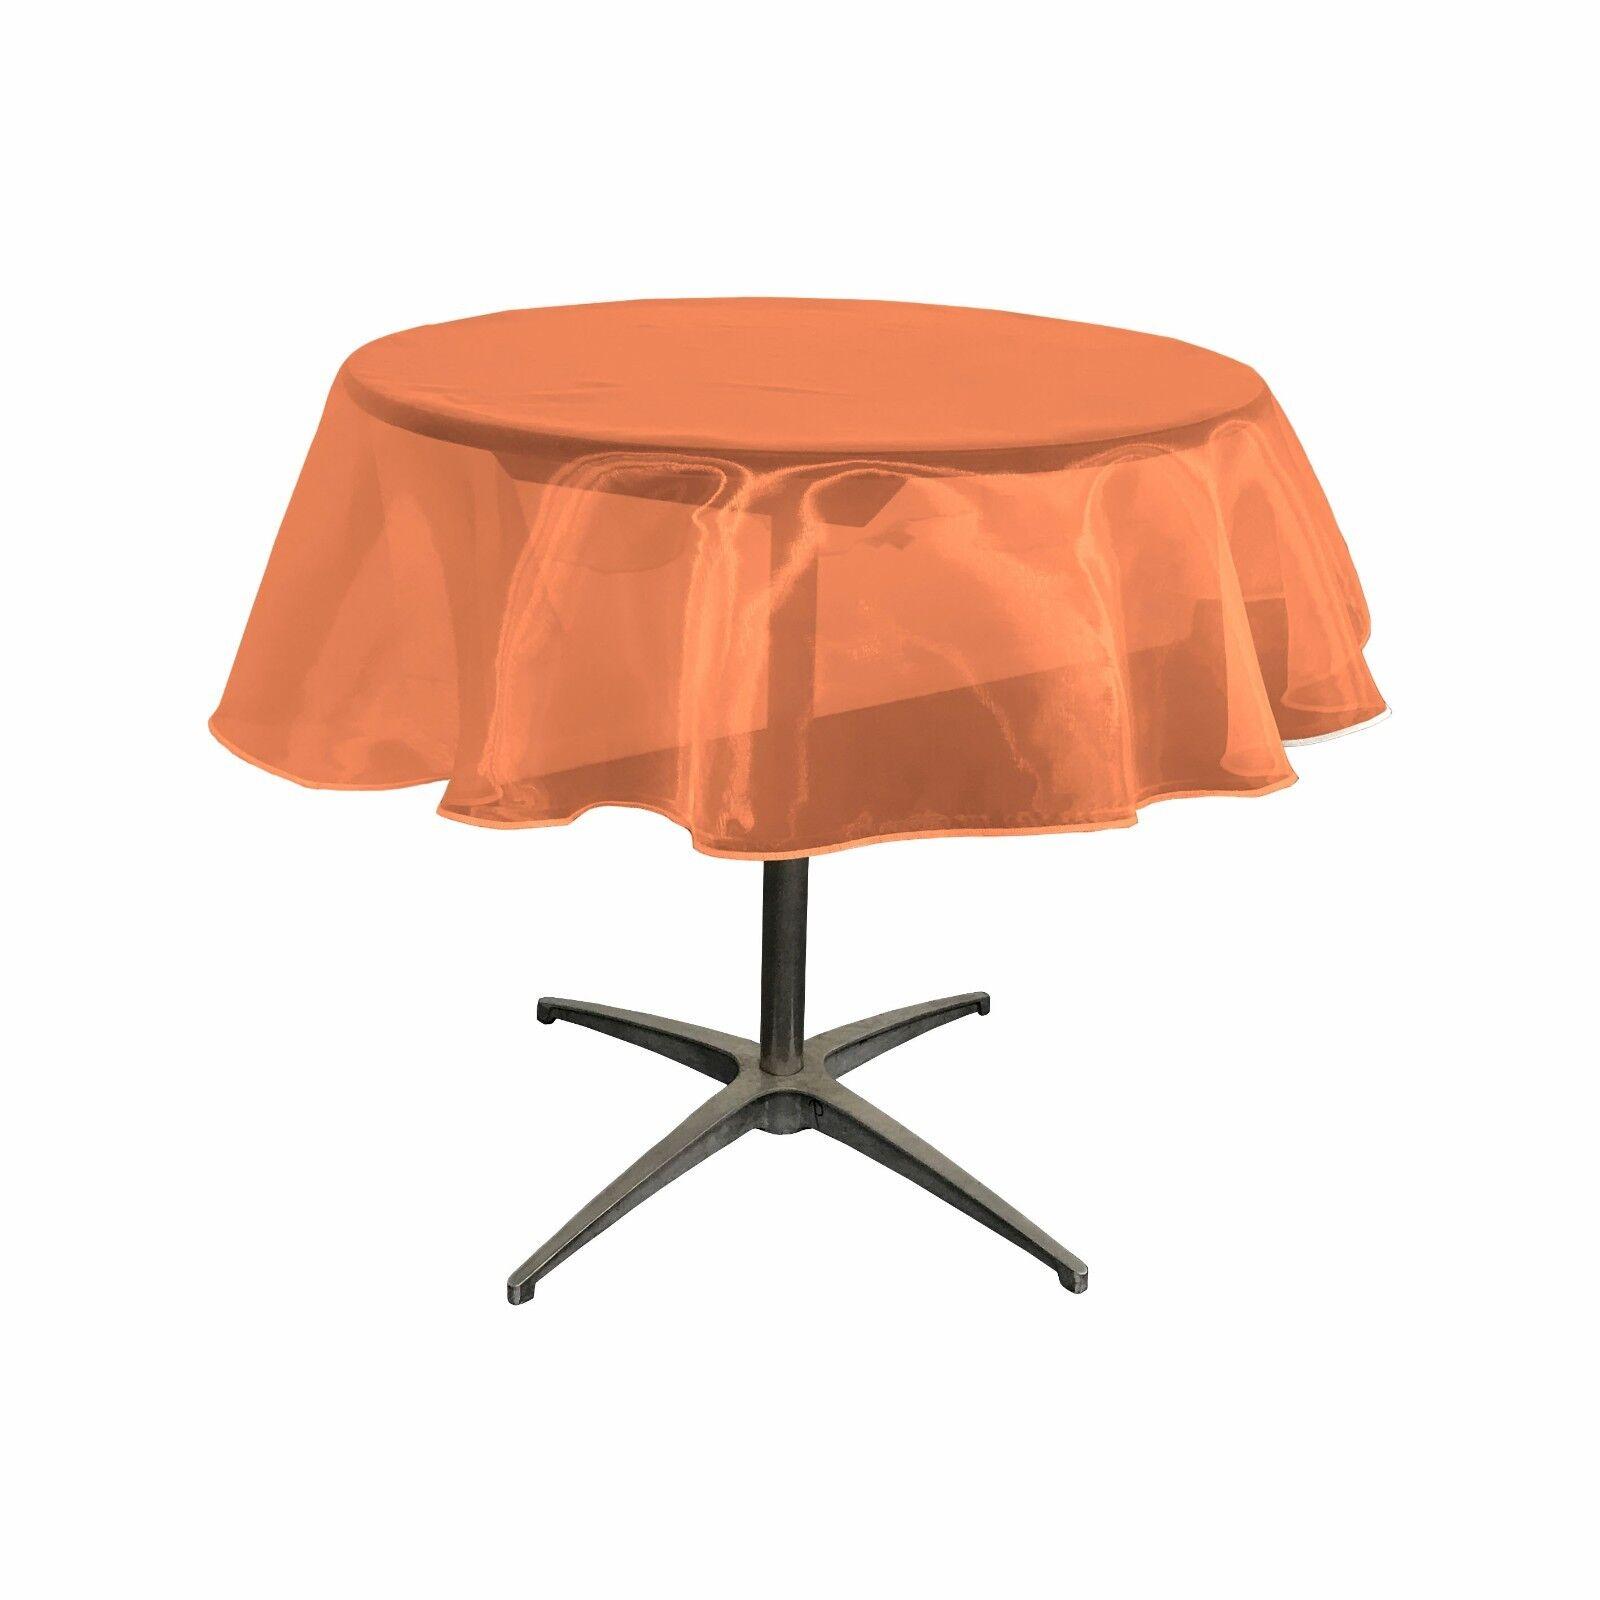 sheer mirror organza tablecloth 51 inch round